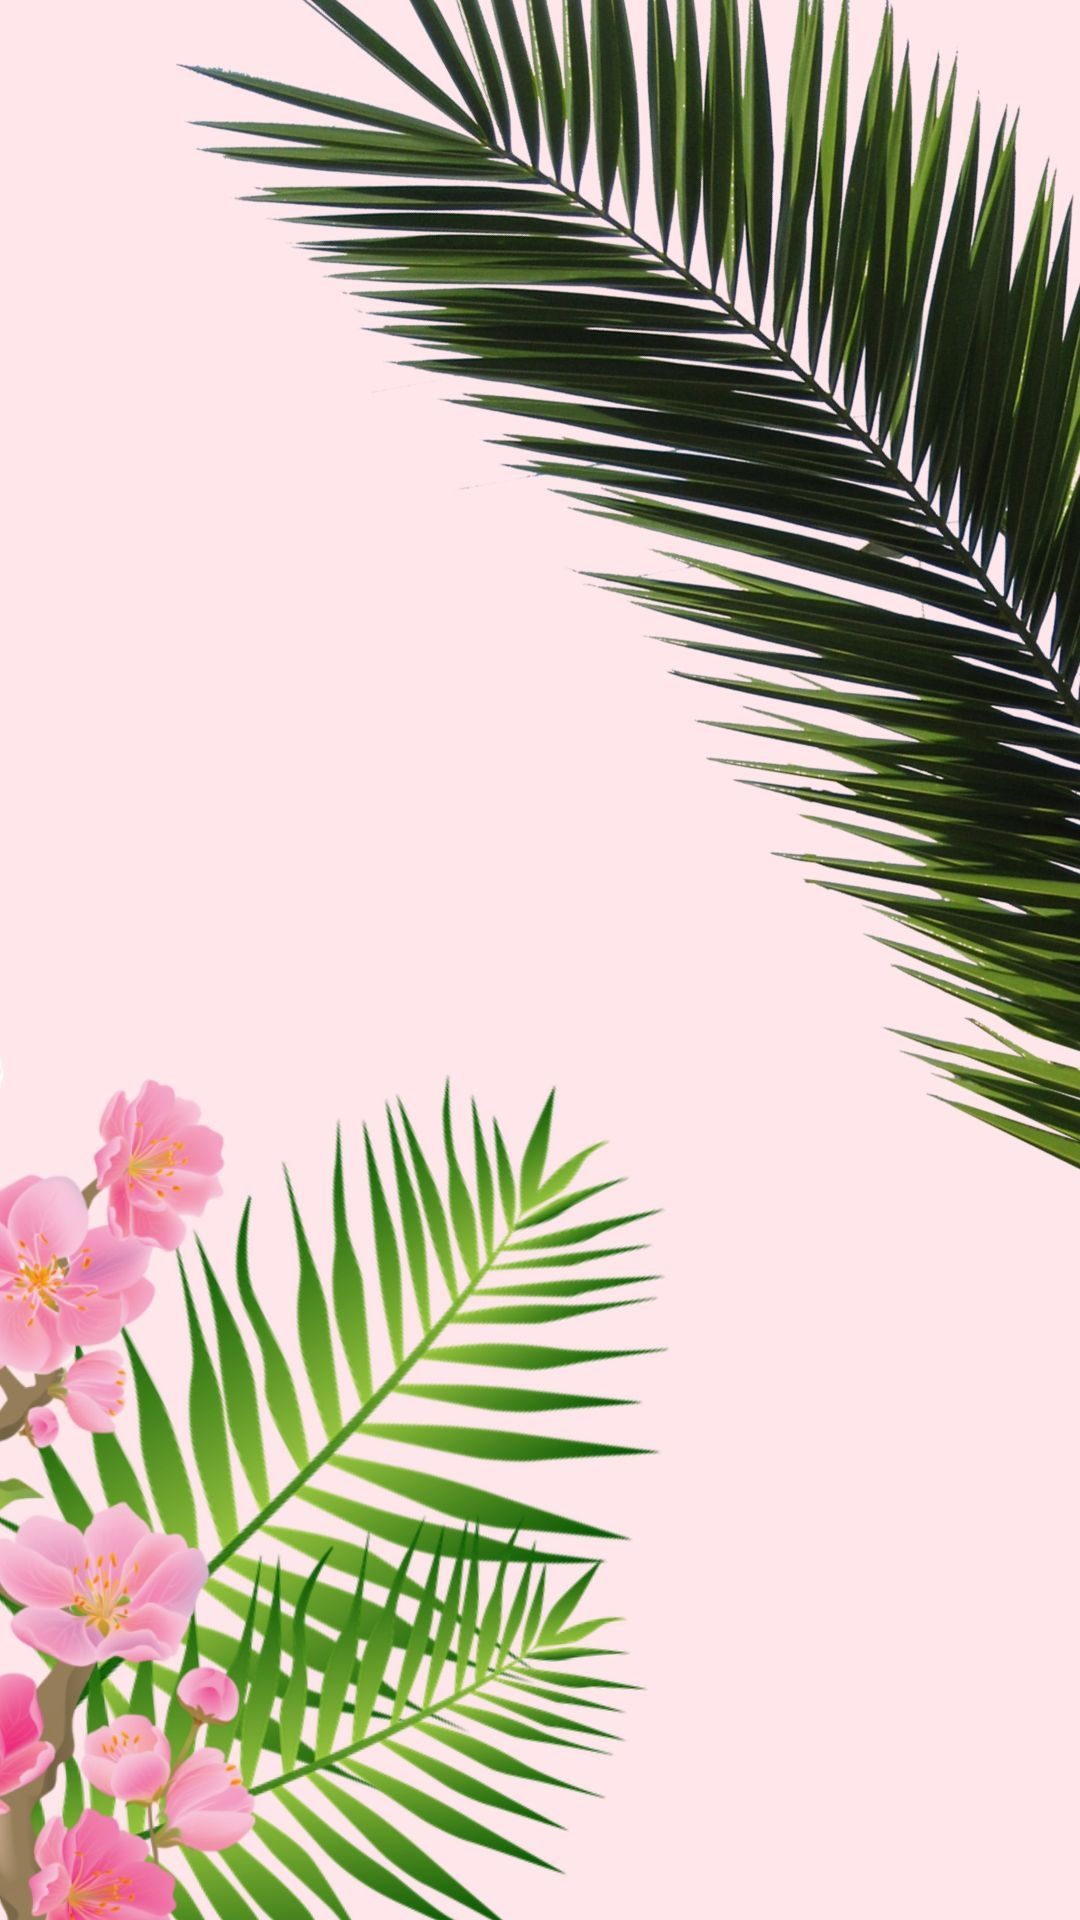 Iphone Wallpaper Vintage Elegant Tropical Wallpaper Iphone